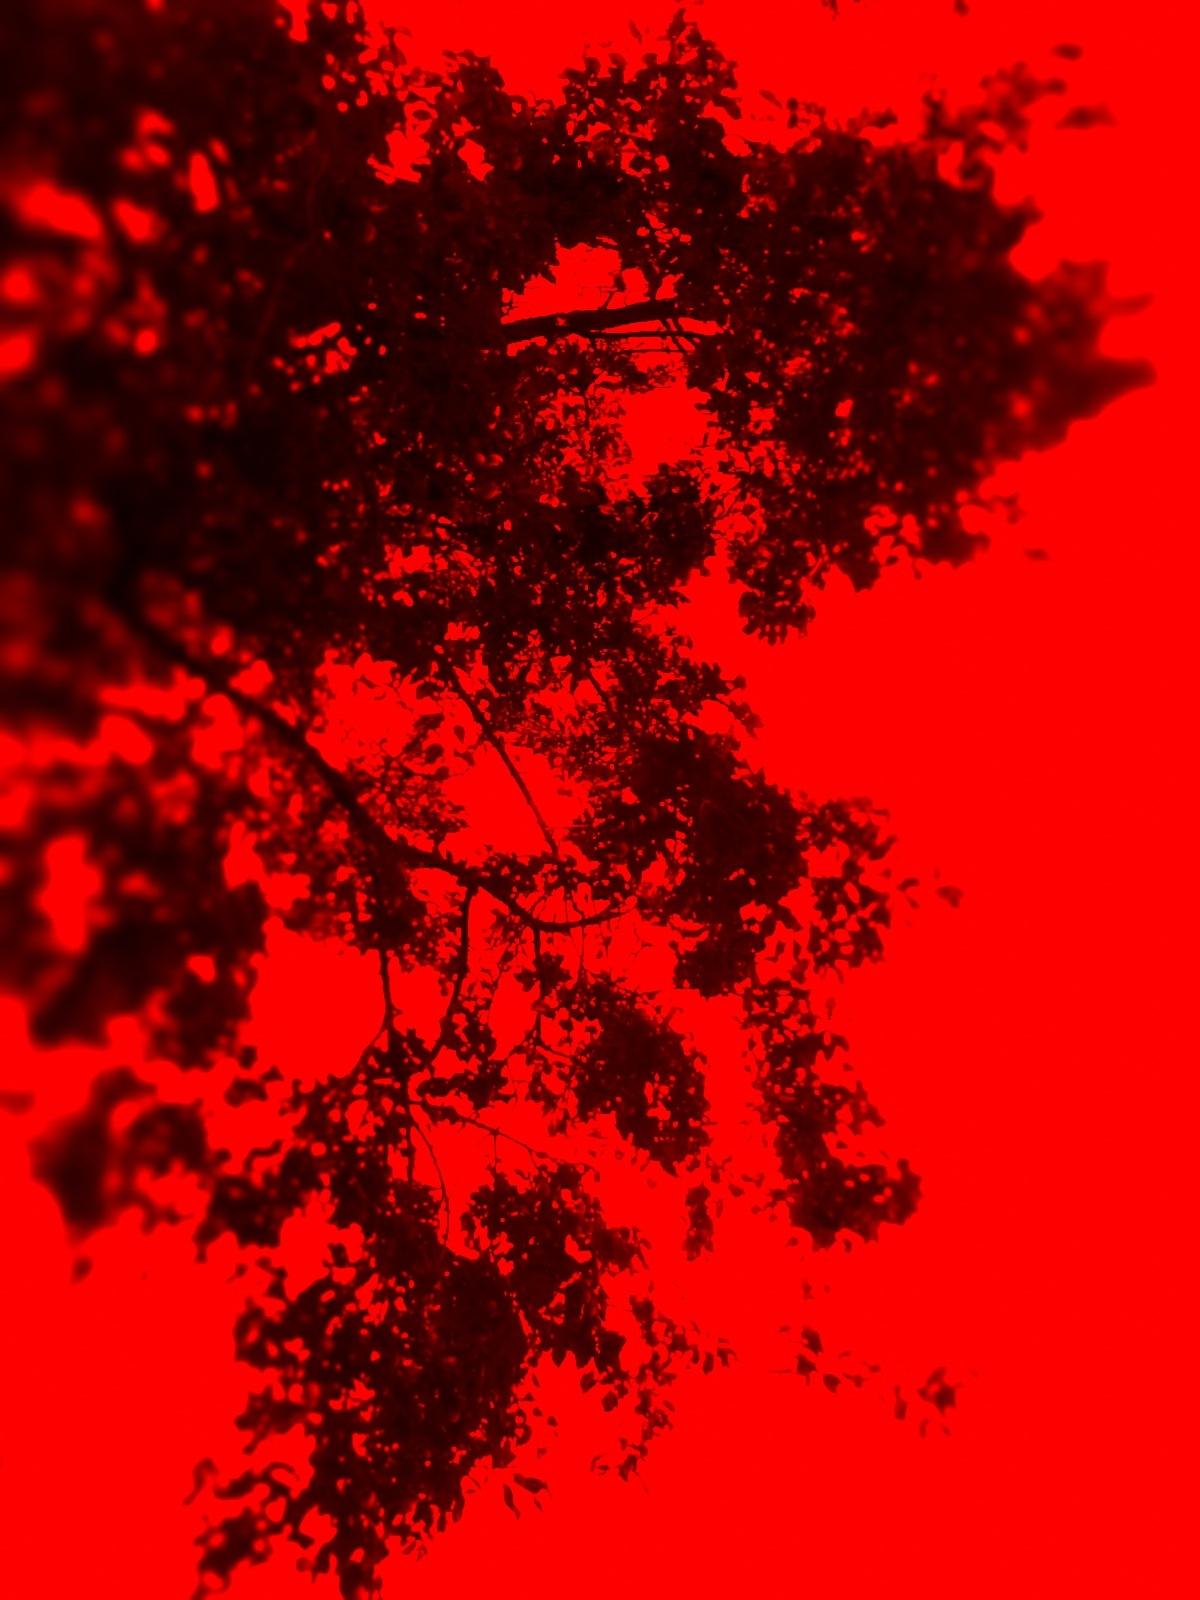 deep red by Mark Barecki